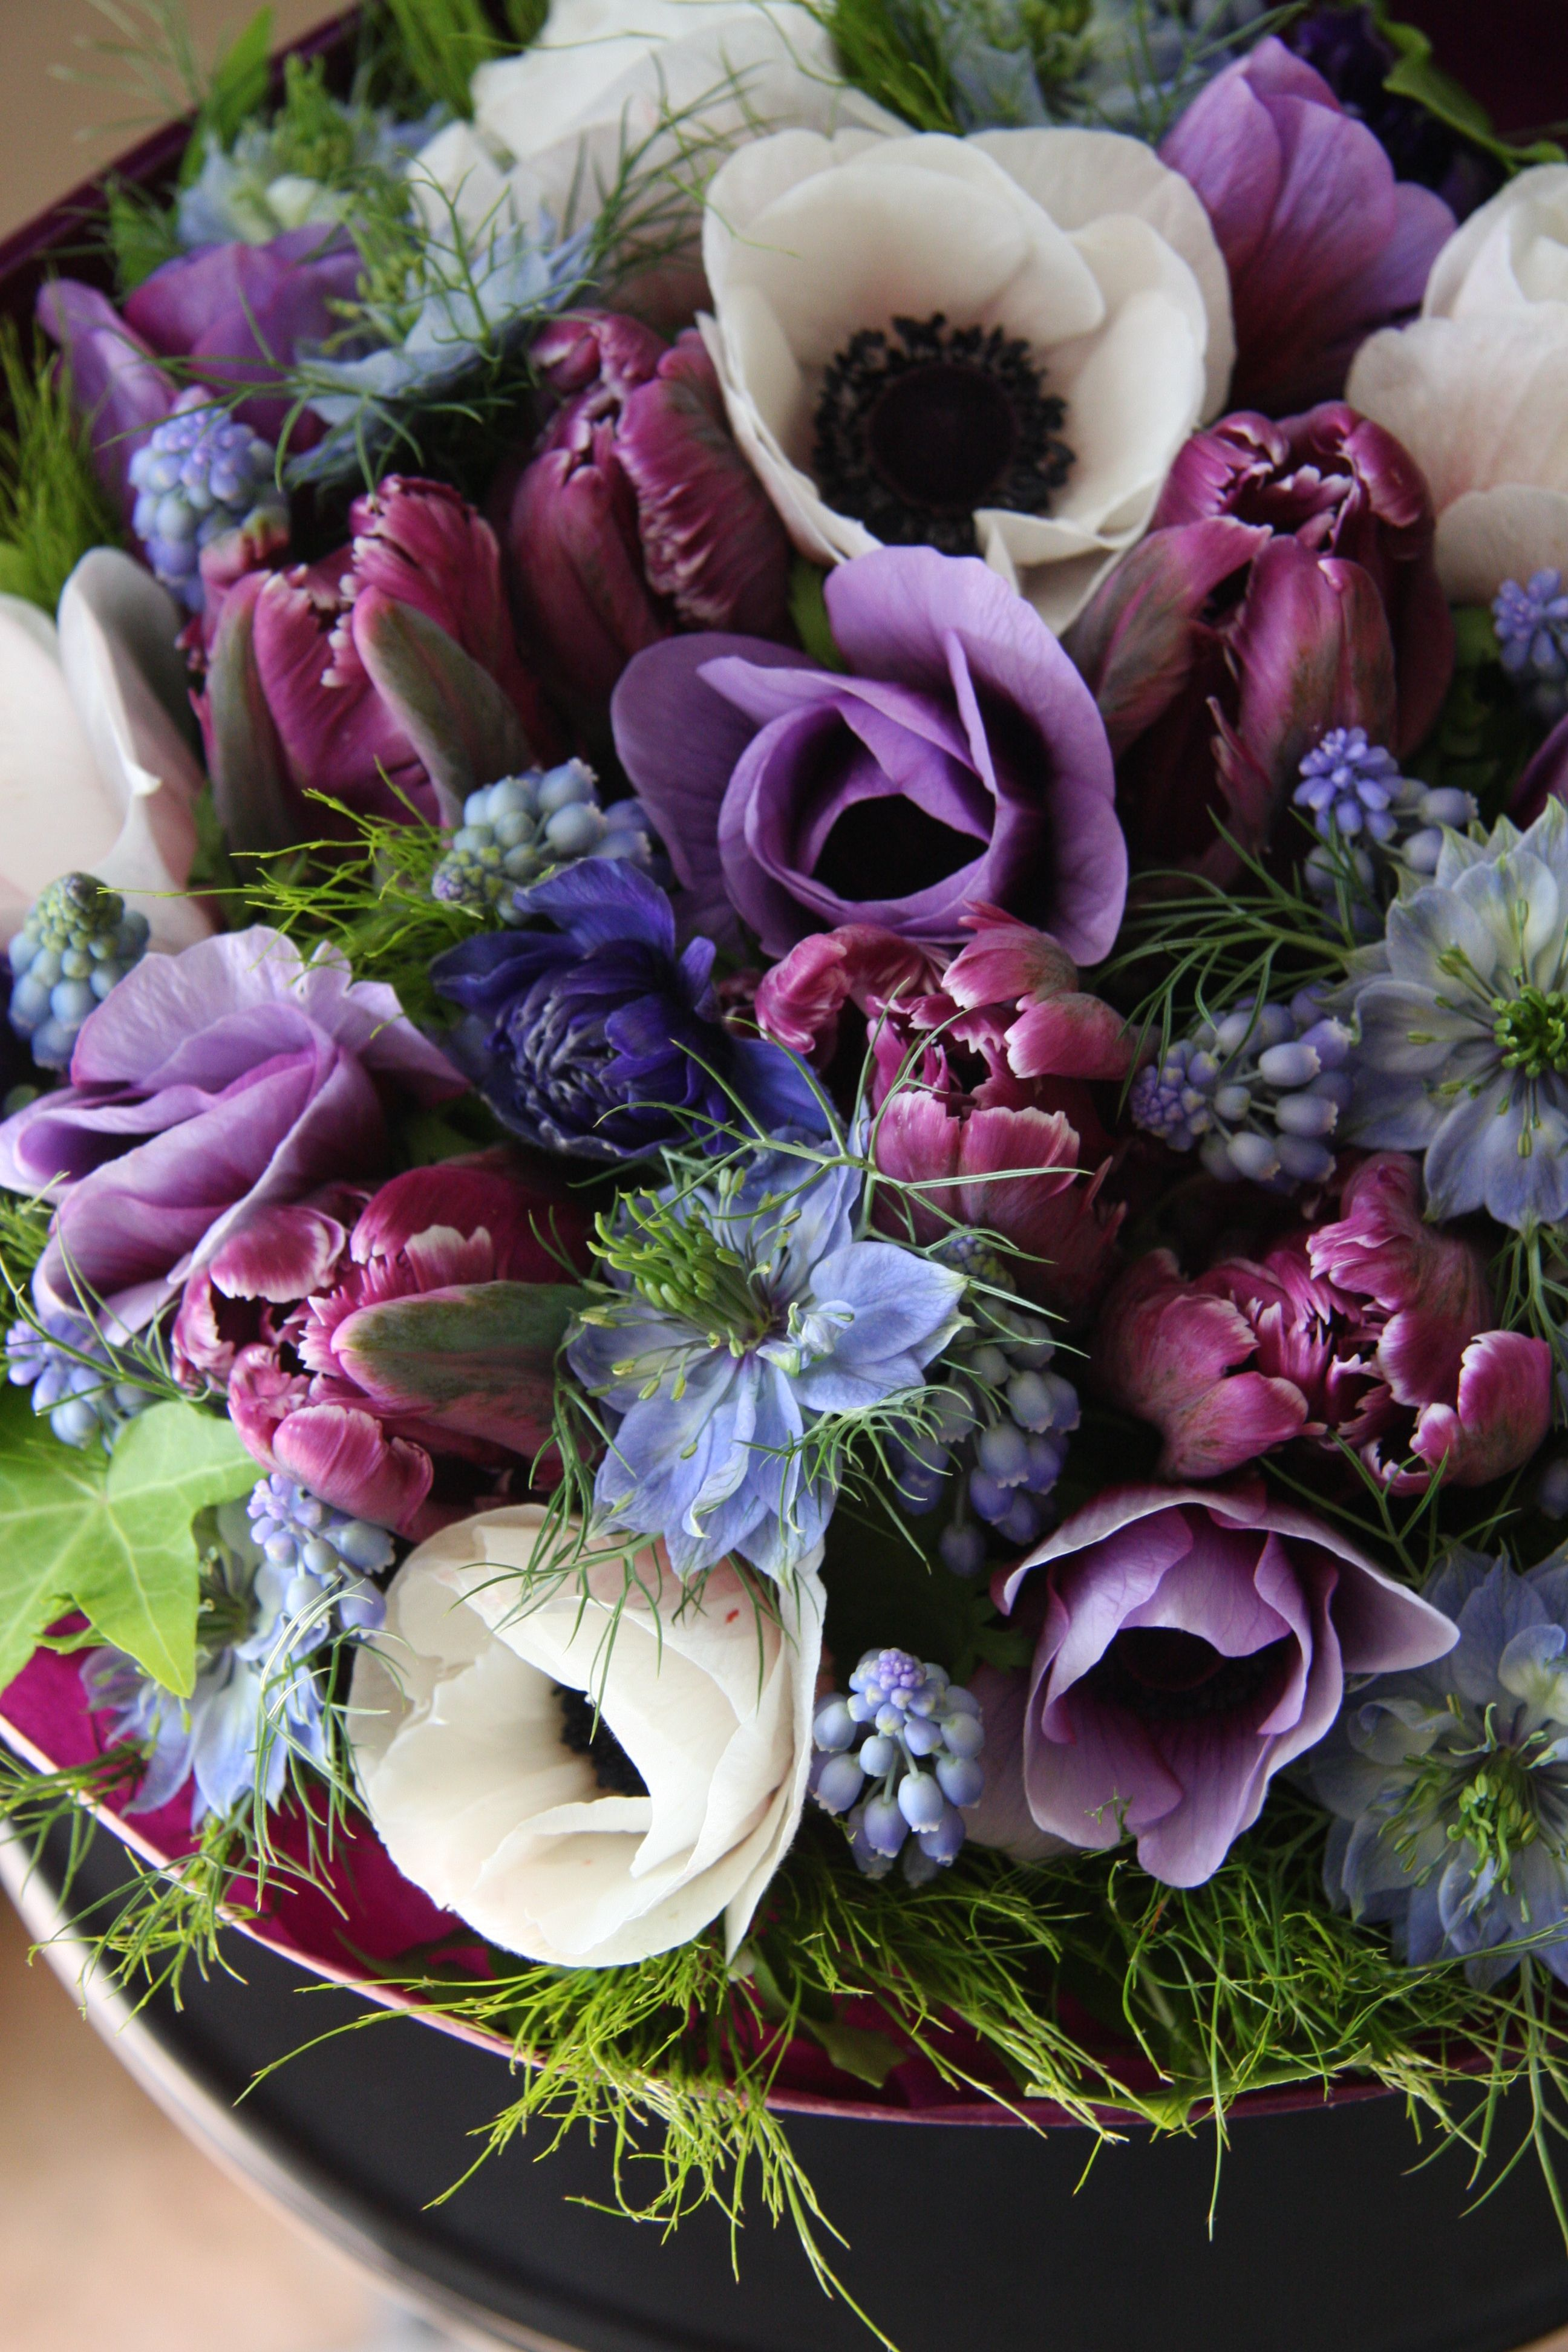 anemone,tulips and muscari! ♥ 美しい花, 葬儀の花, フラワーブーケ